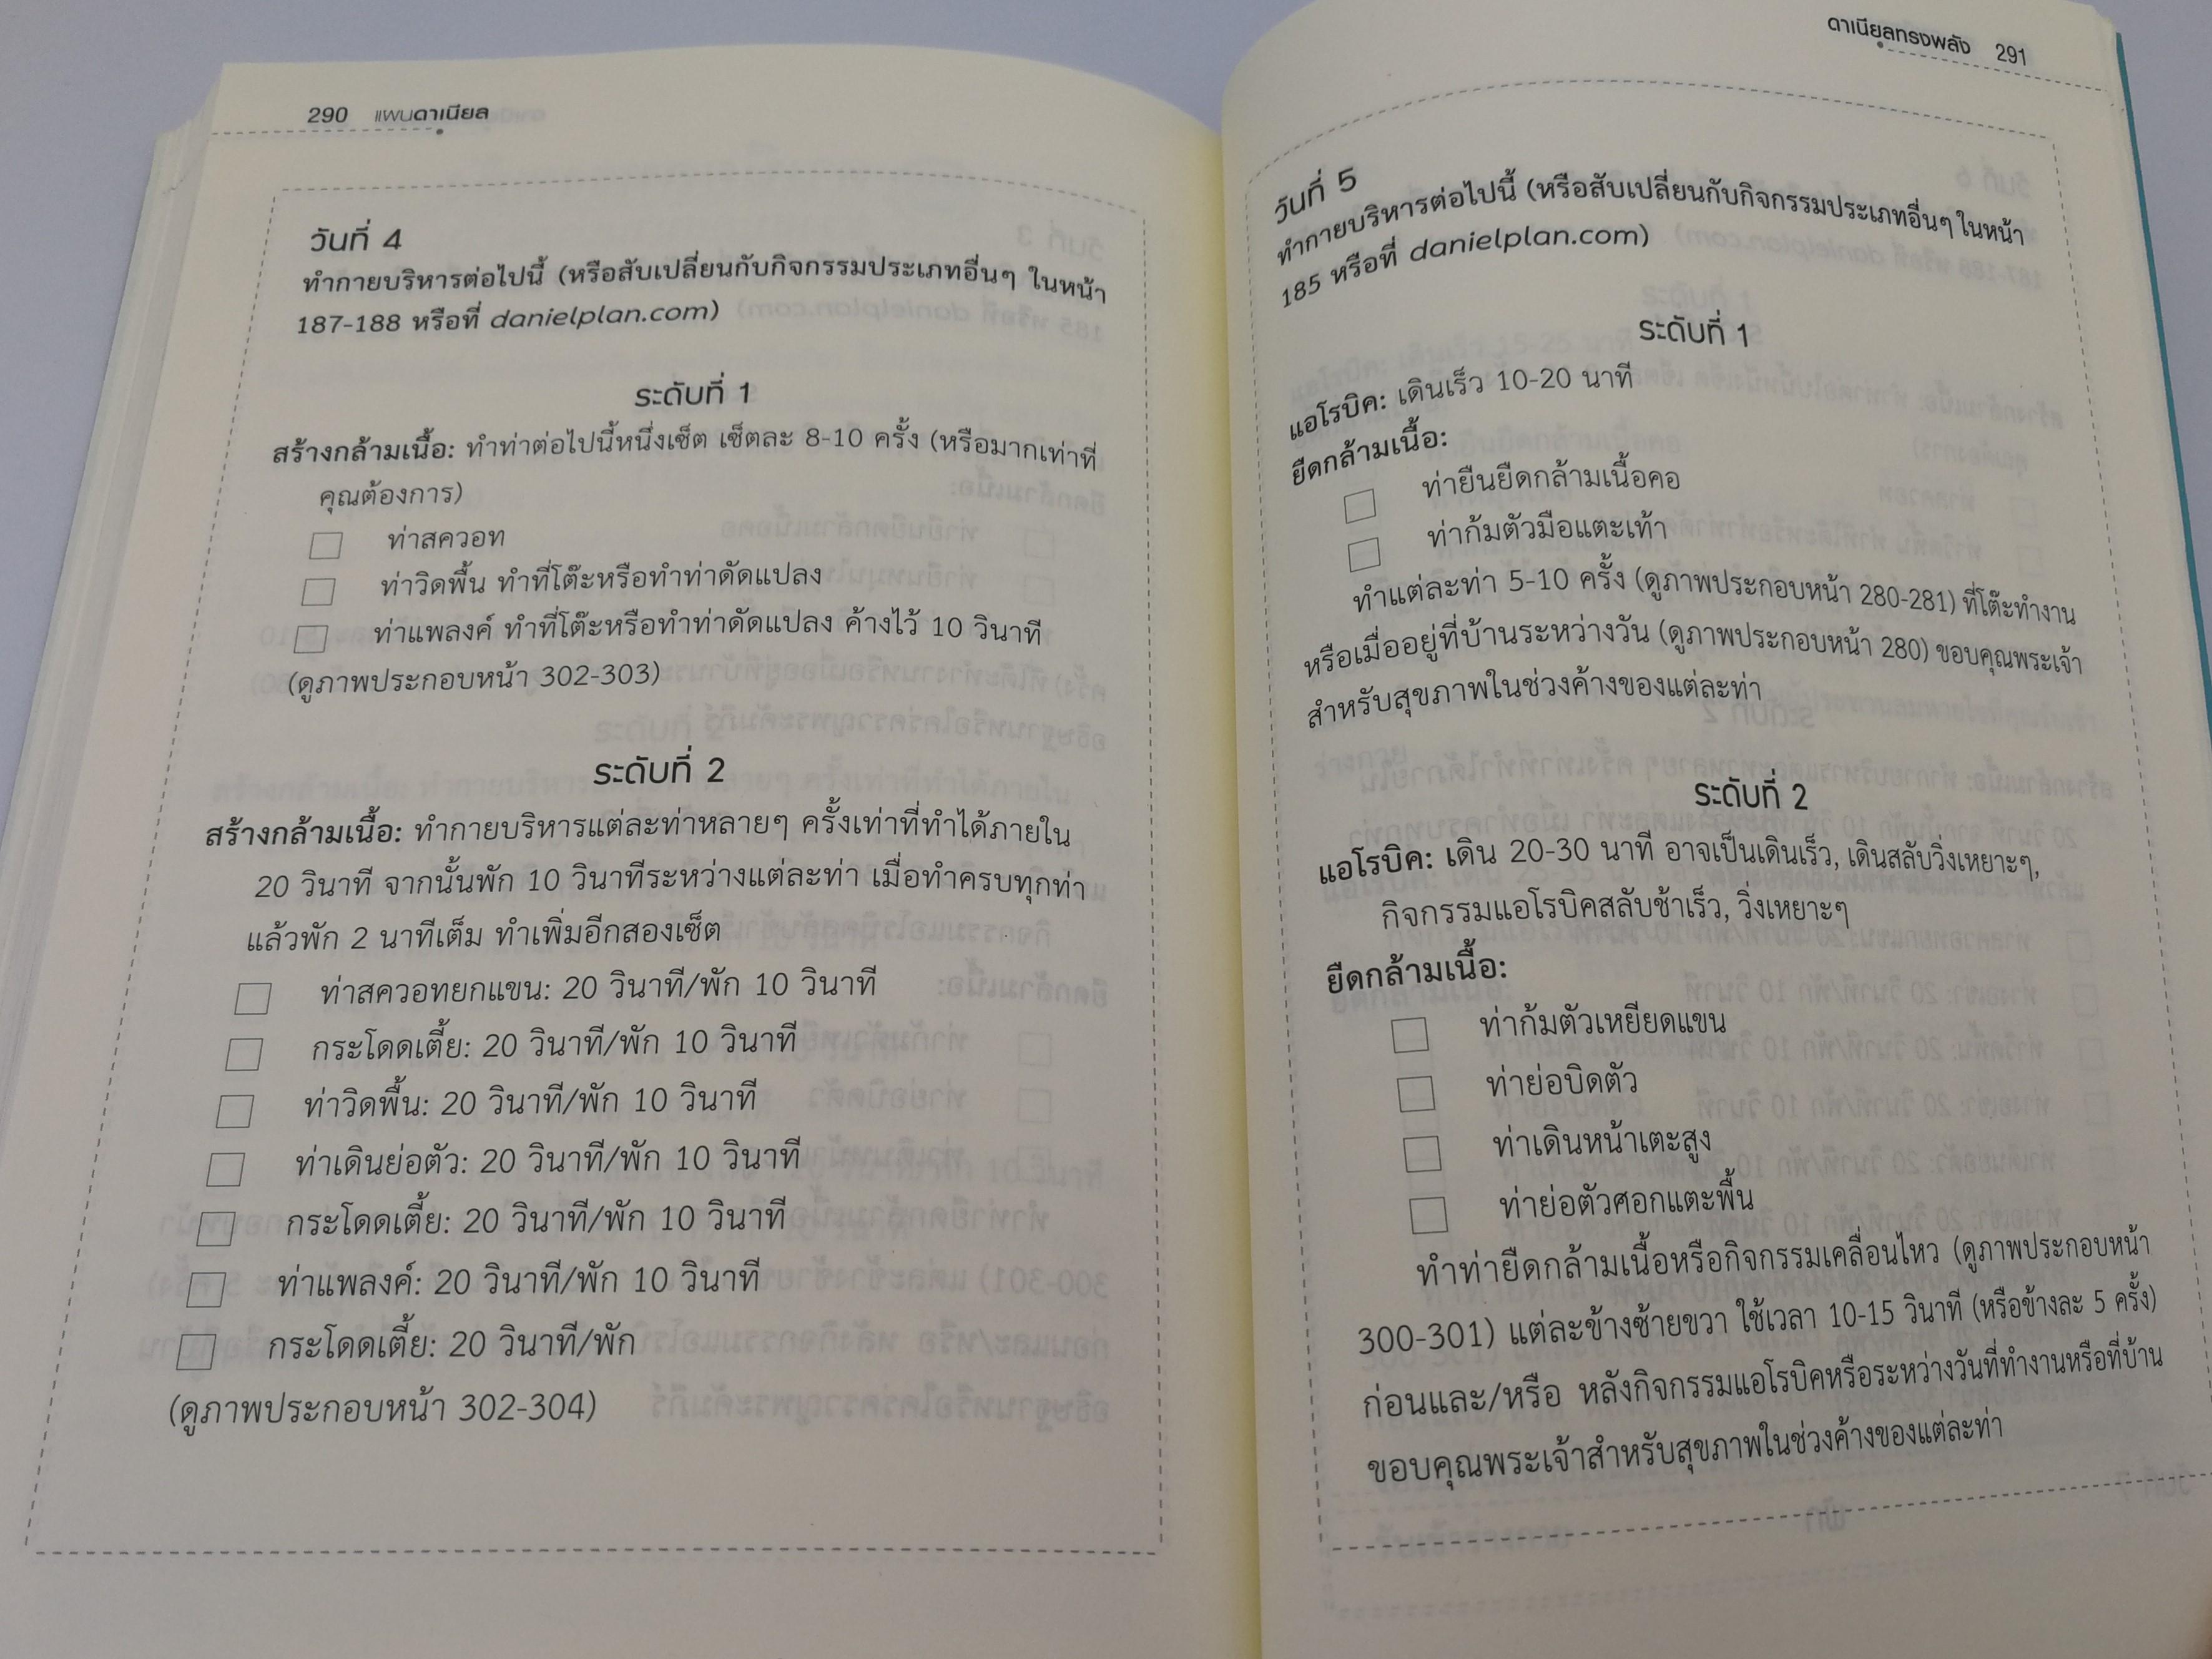 -ced-thai-language-edition-of-the-daniel-plan-12.jpg